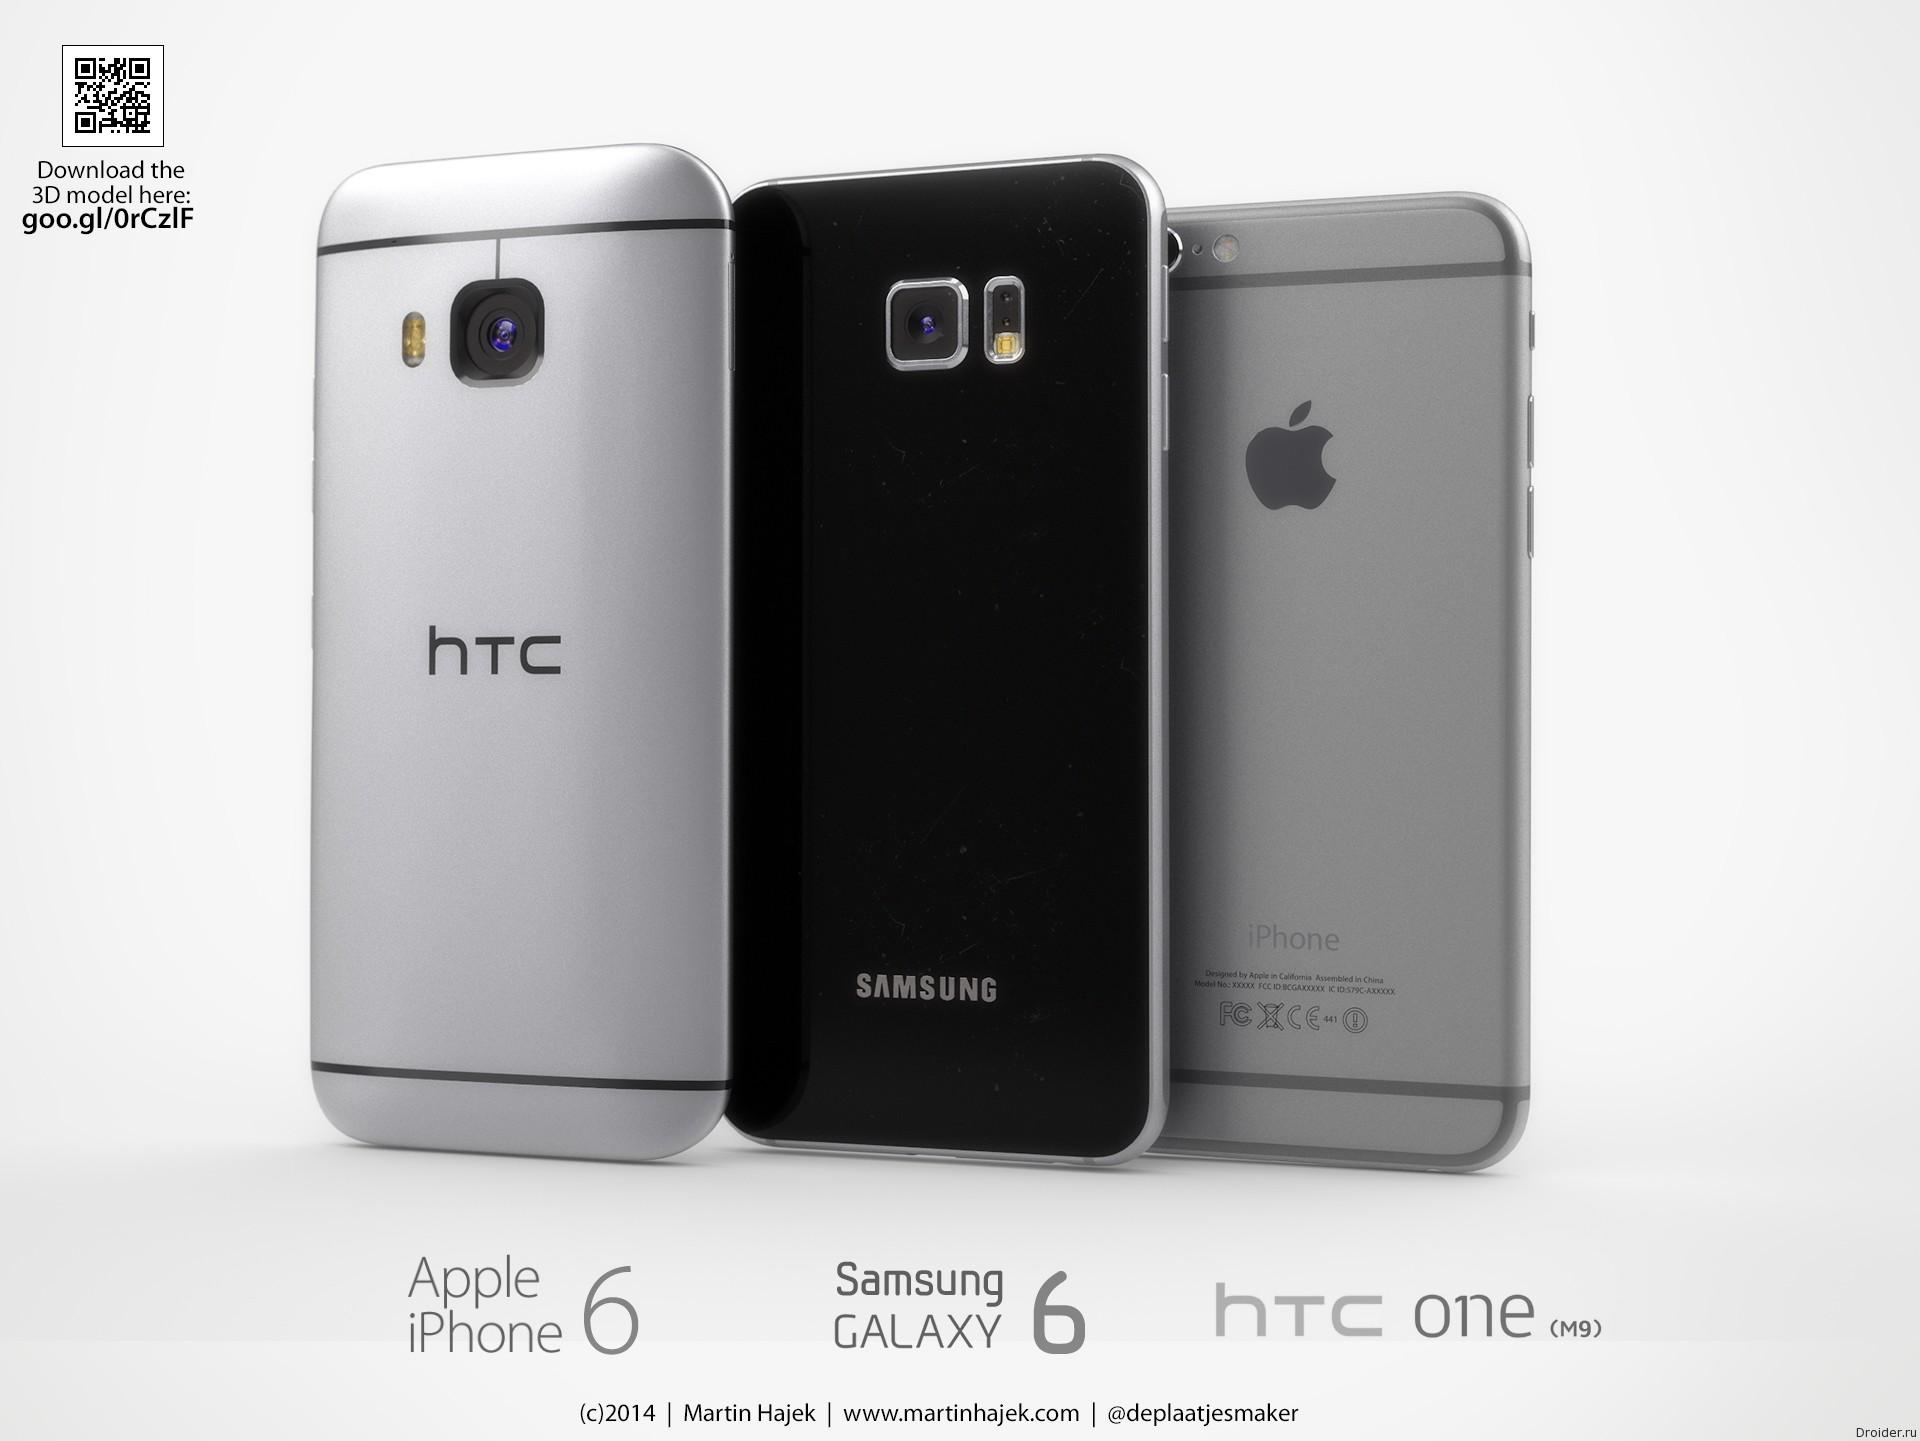 HTC One M9, Samsung Galaxy S6 и iPhone 6